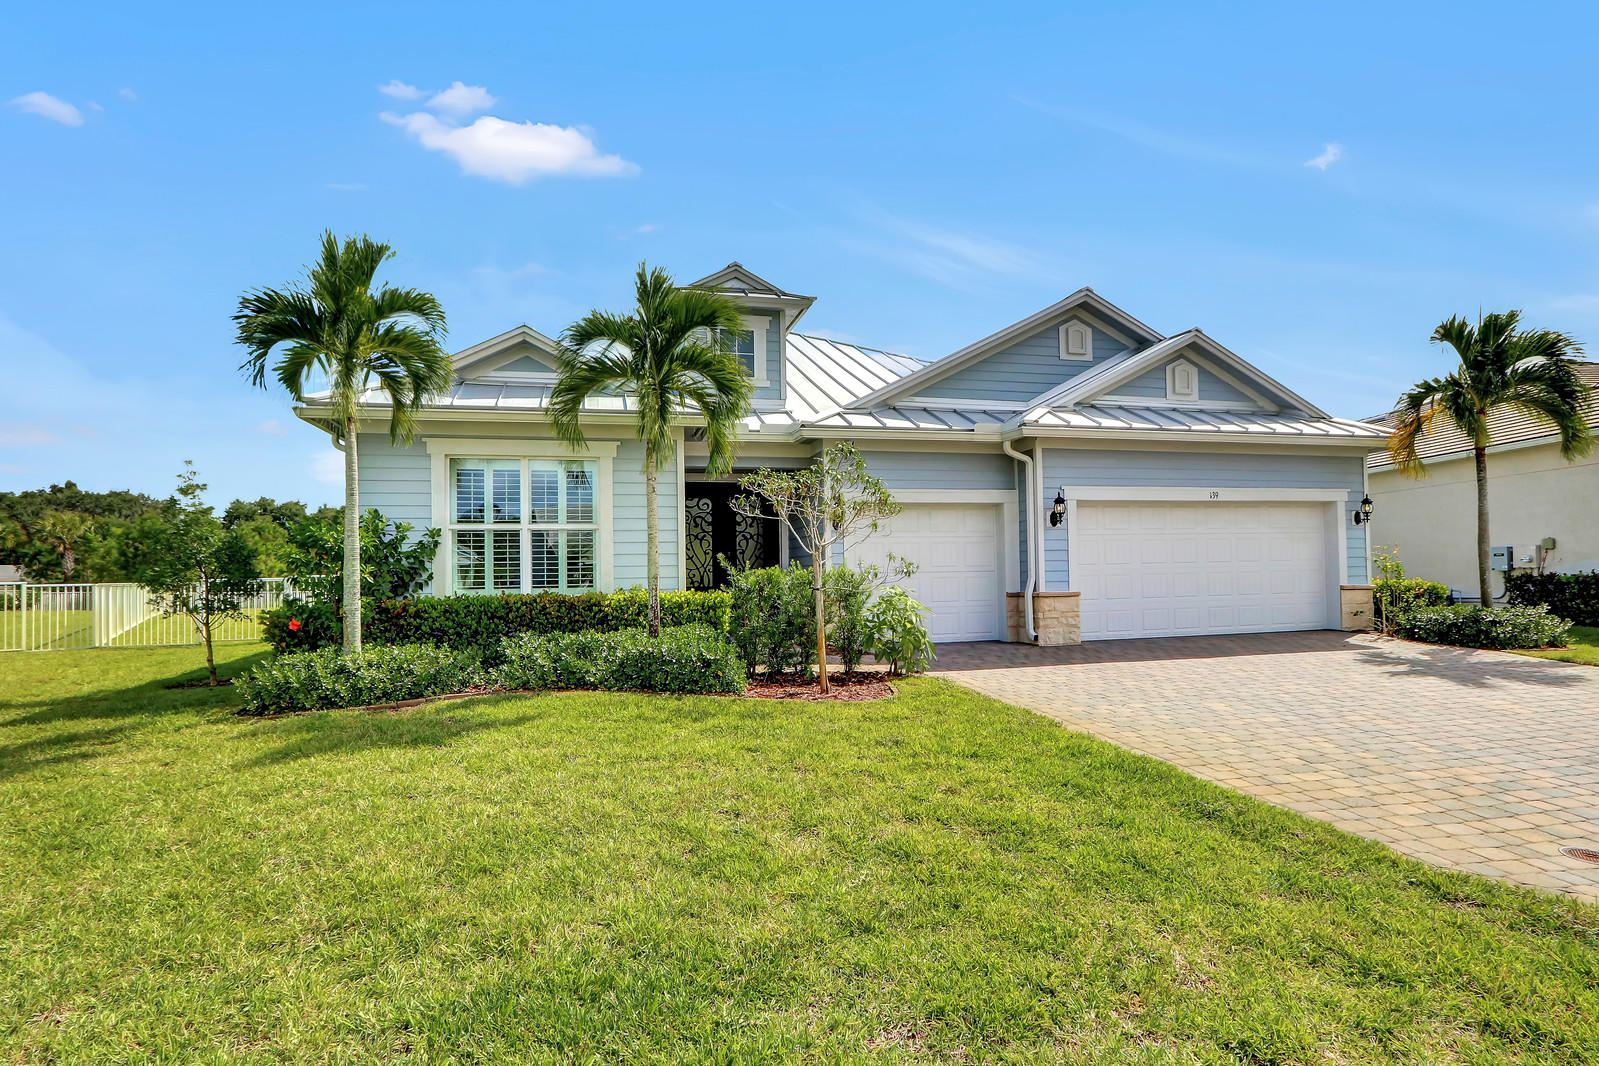 139 Shores Pointe Drive, Jupiter, FL 33458 - #: RX-10636078